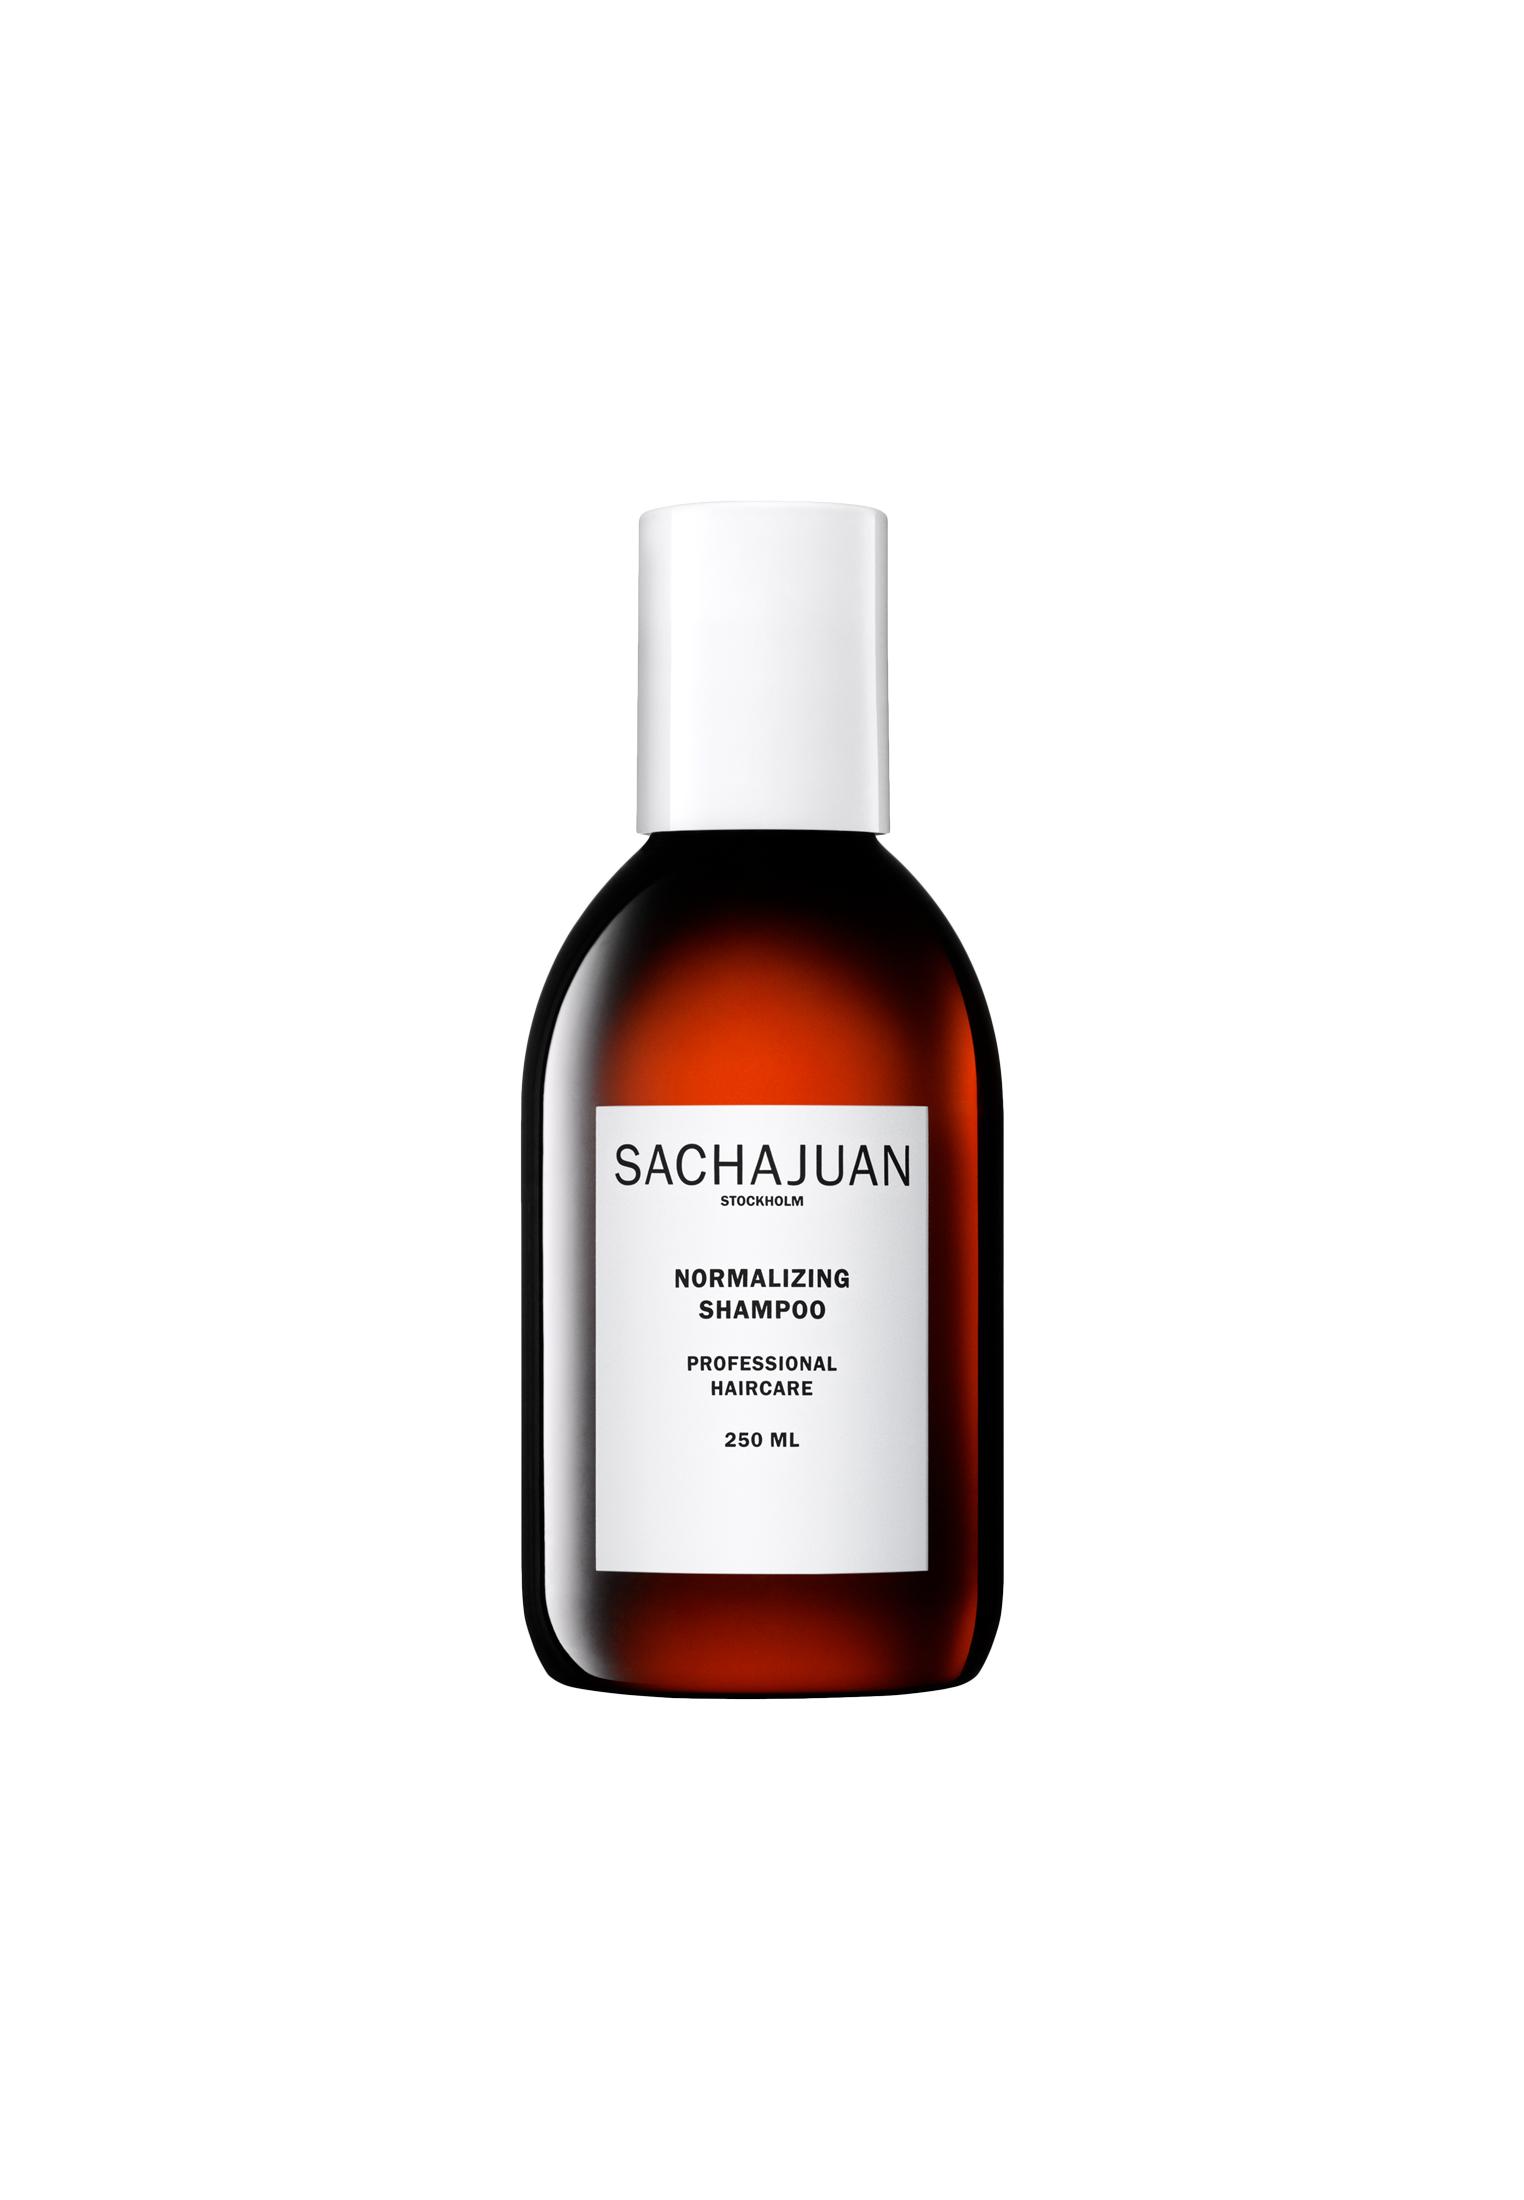 SACHAJUAN - Normalizing Shampoo - 250 ml